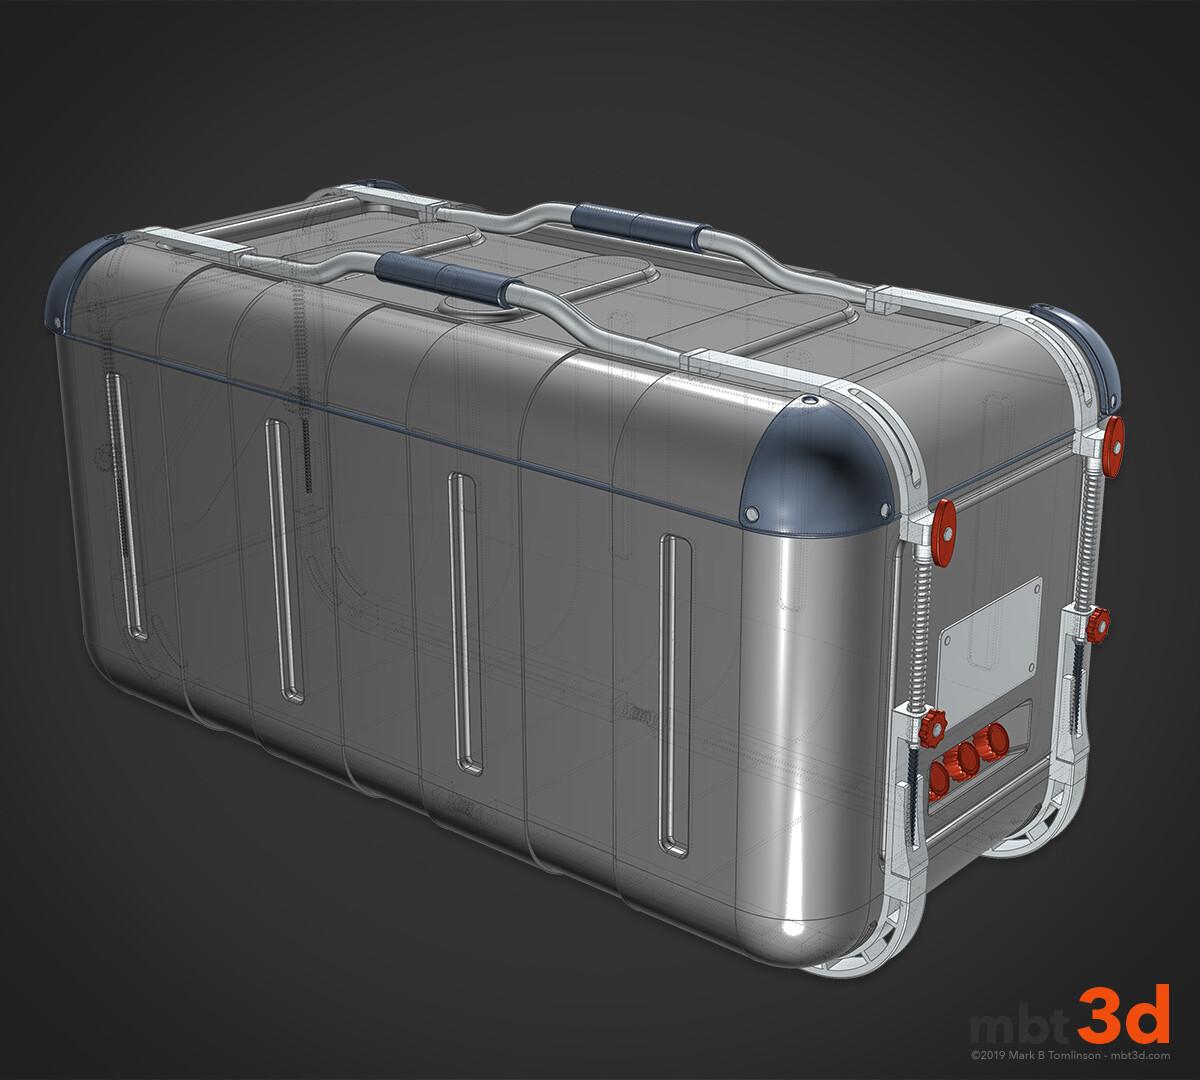 Crate: